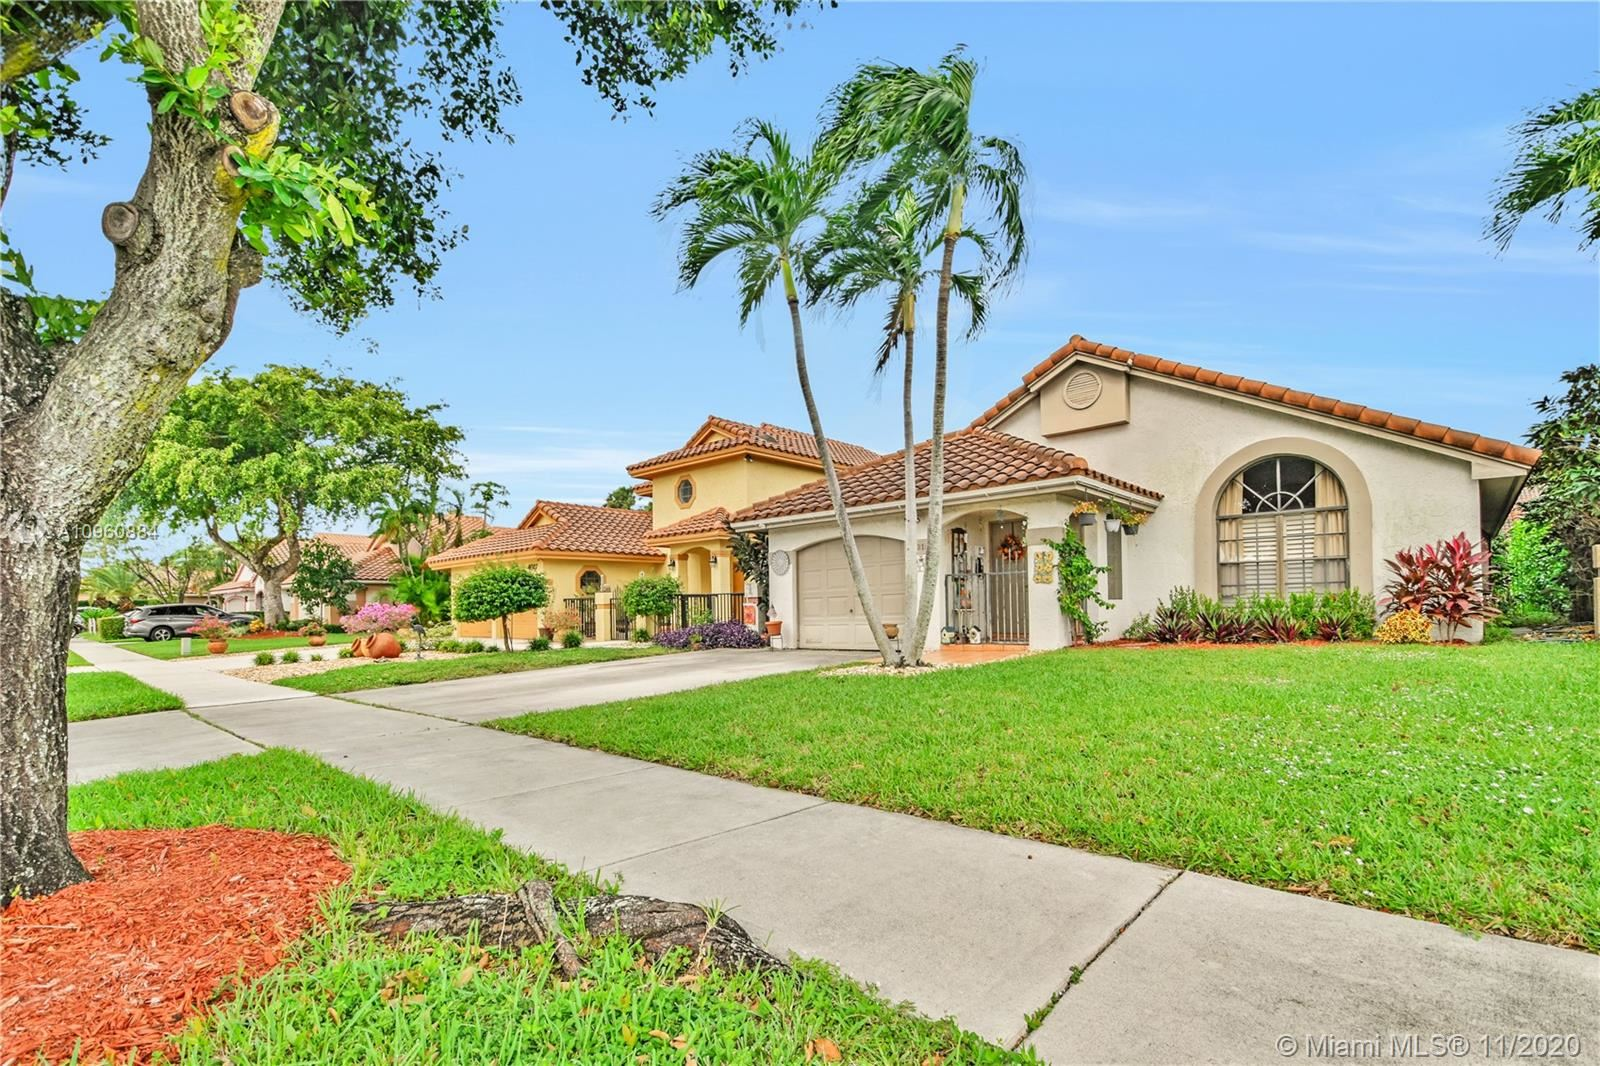 Photo of 4015 NW 5th Dr, Deerfield Beach, FL 33442 (MLS # A10960884)